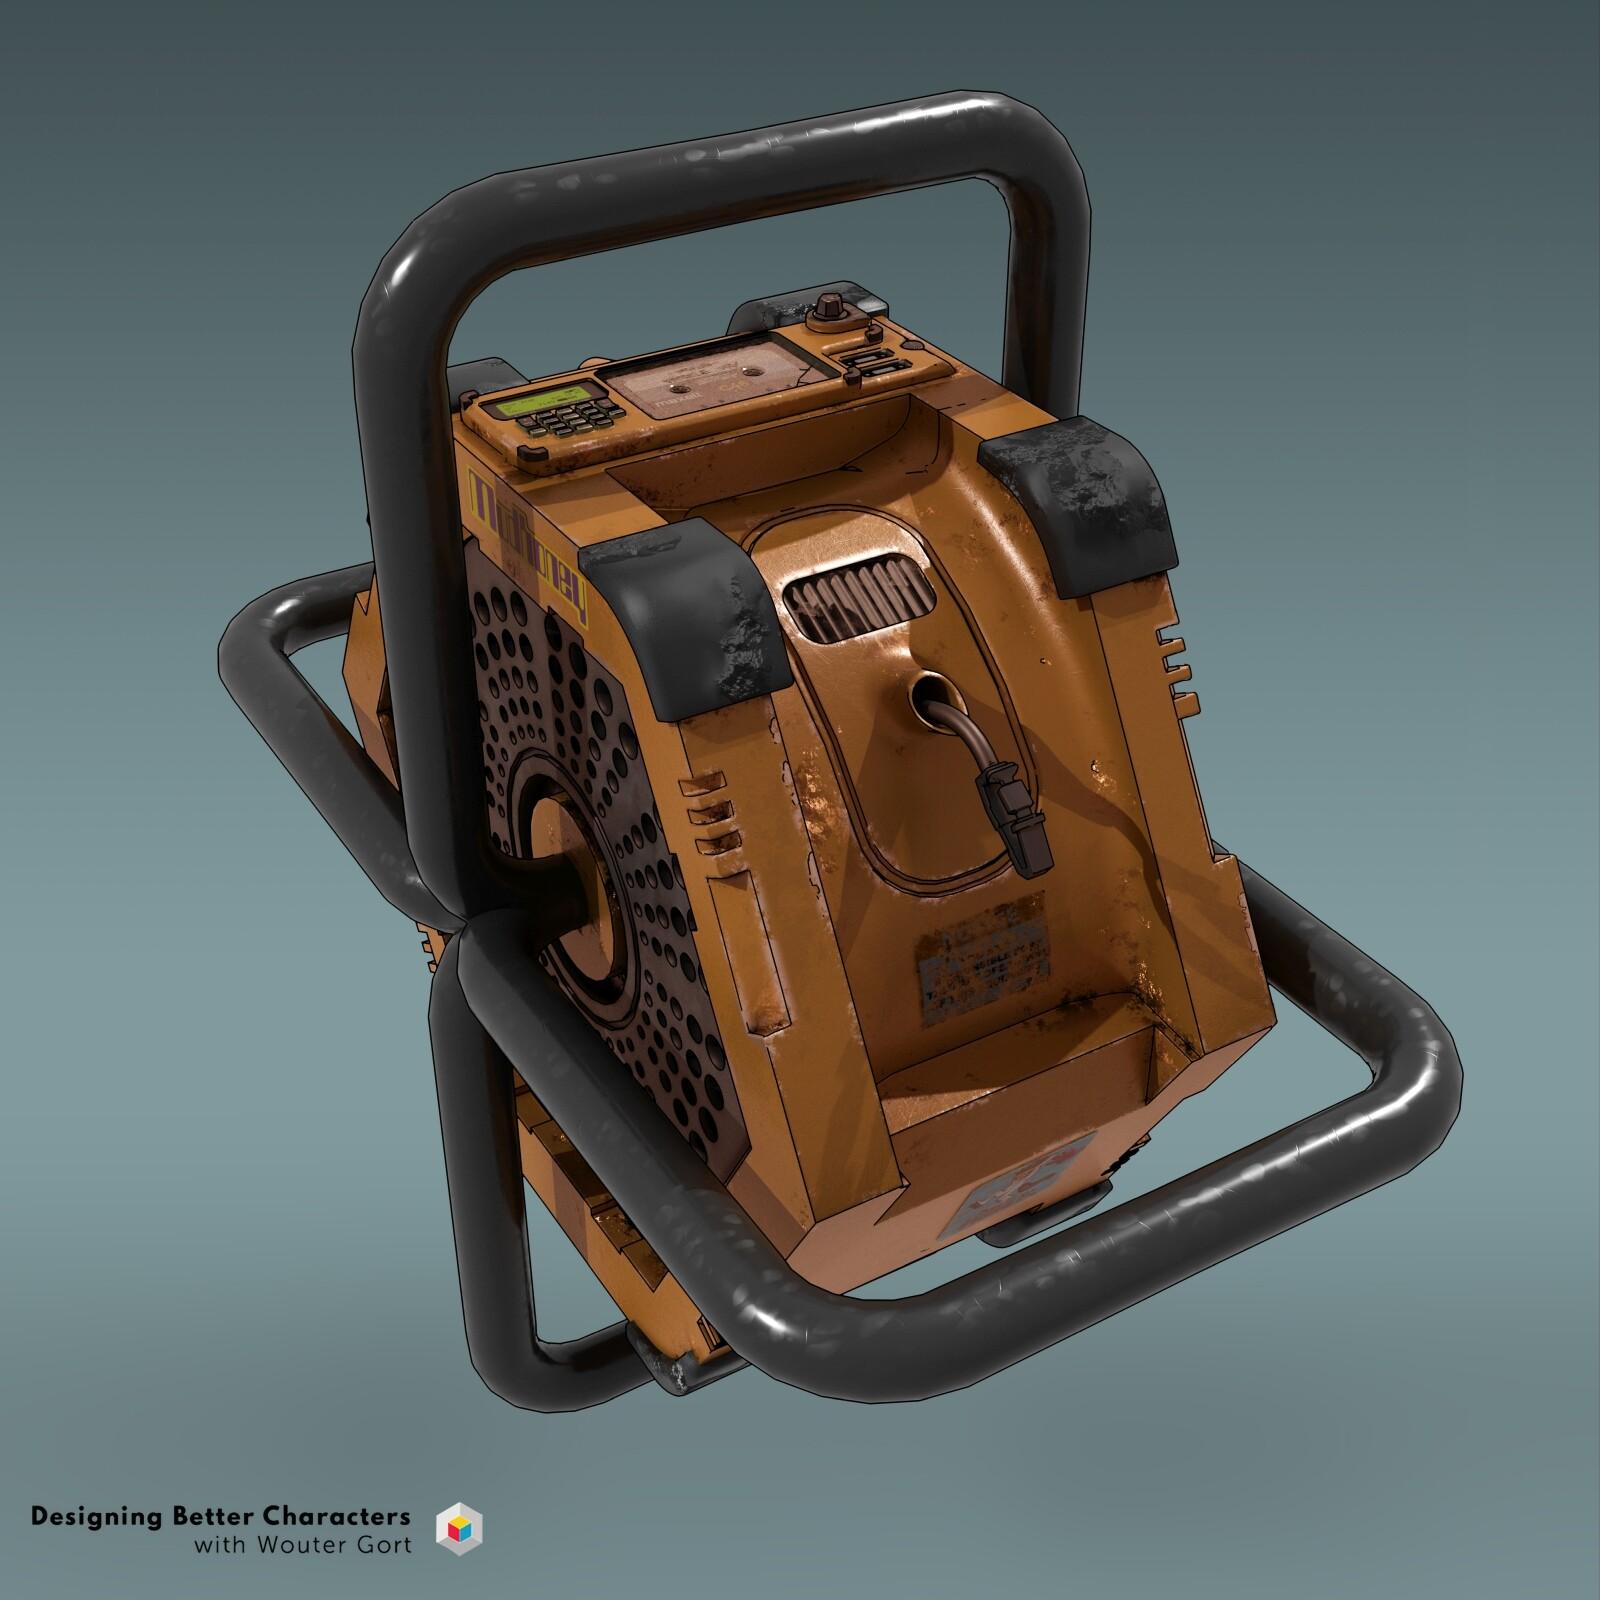 reel / winch design